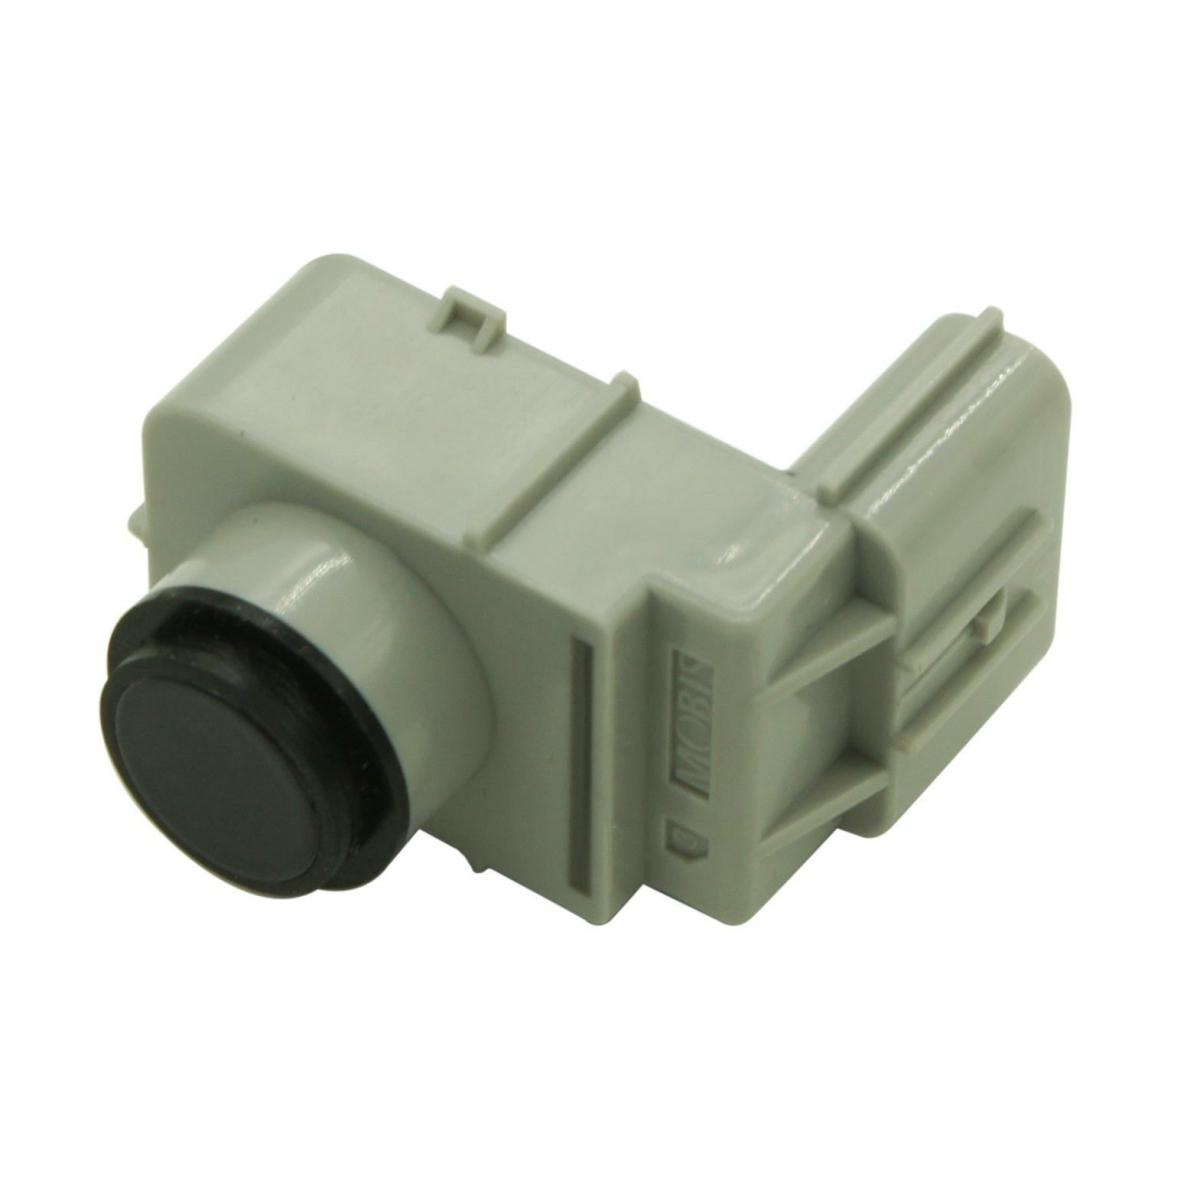 Park sensor 95720-0U000 for Hyundai PDC Parktronic